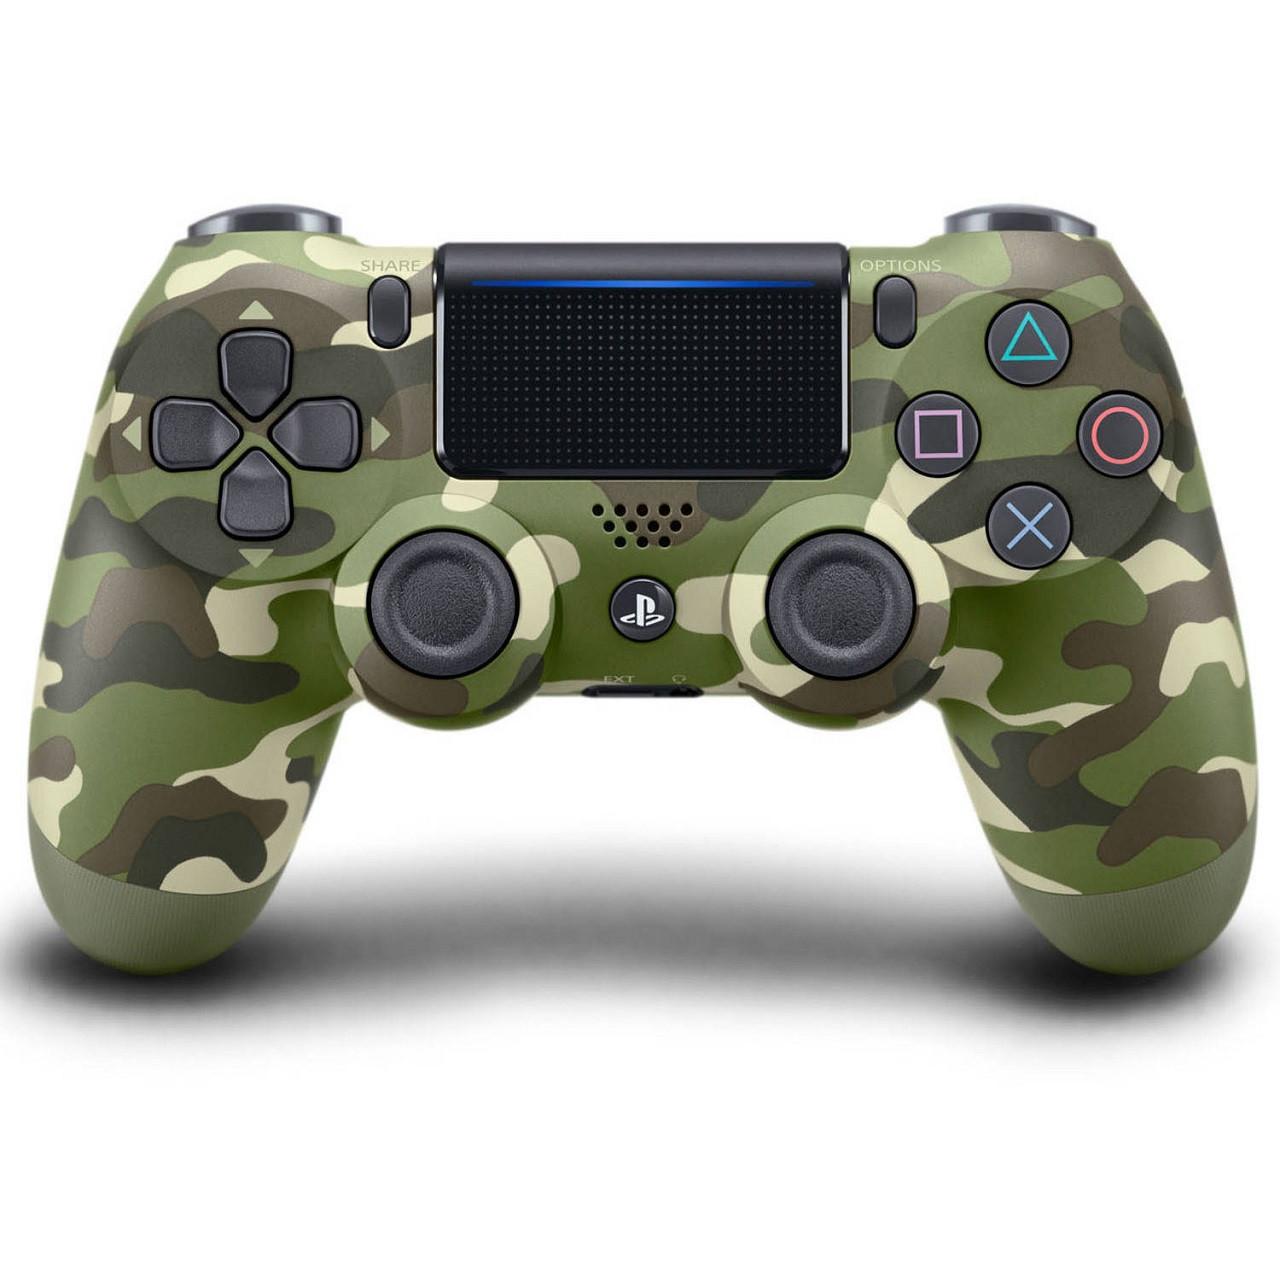 Геймпад (Джойстик) Sony PS4 Dualshock 4 V2 Green Camouflage